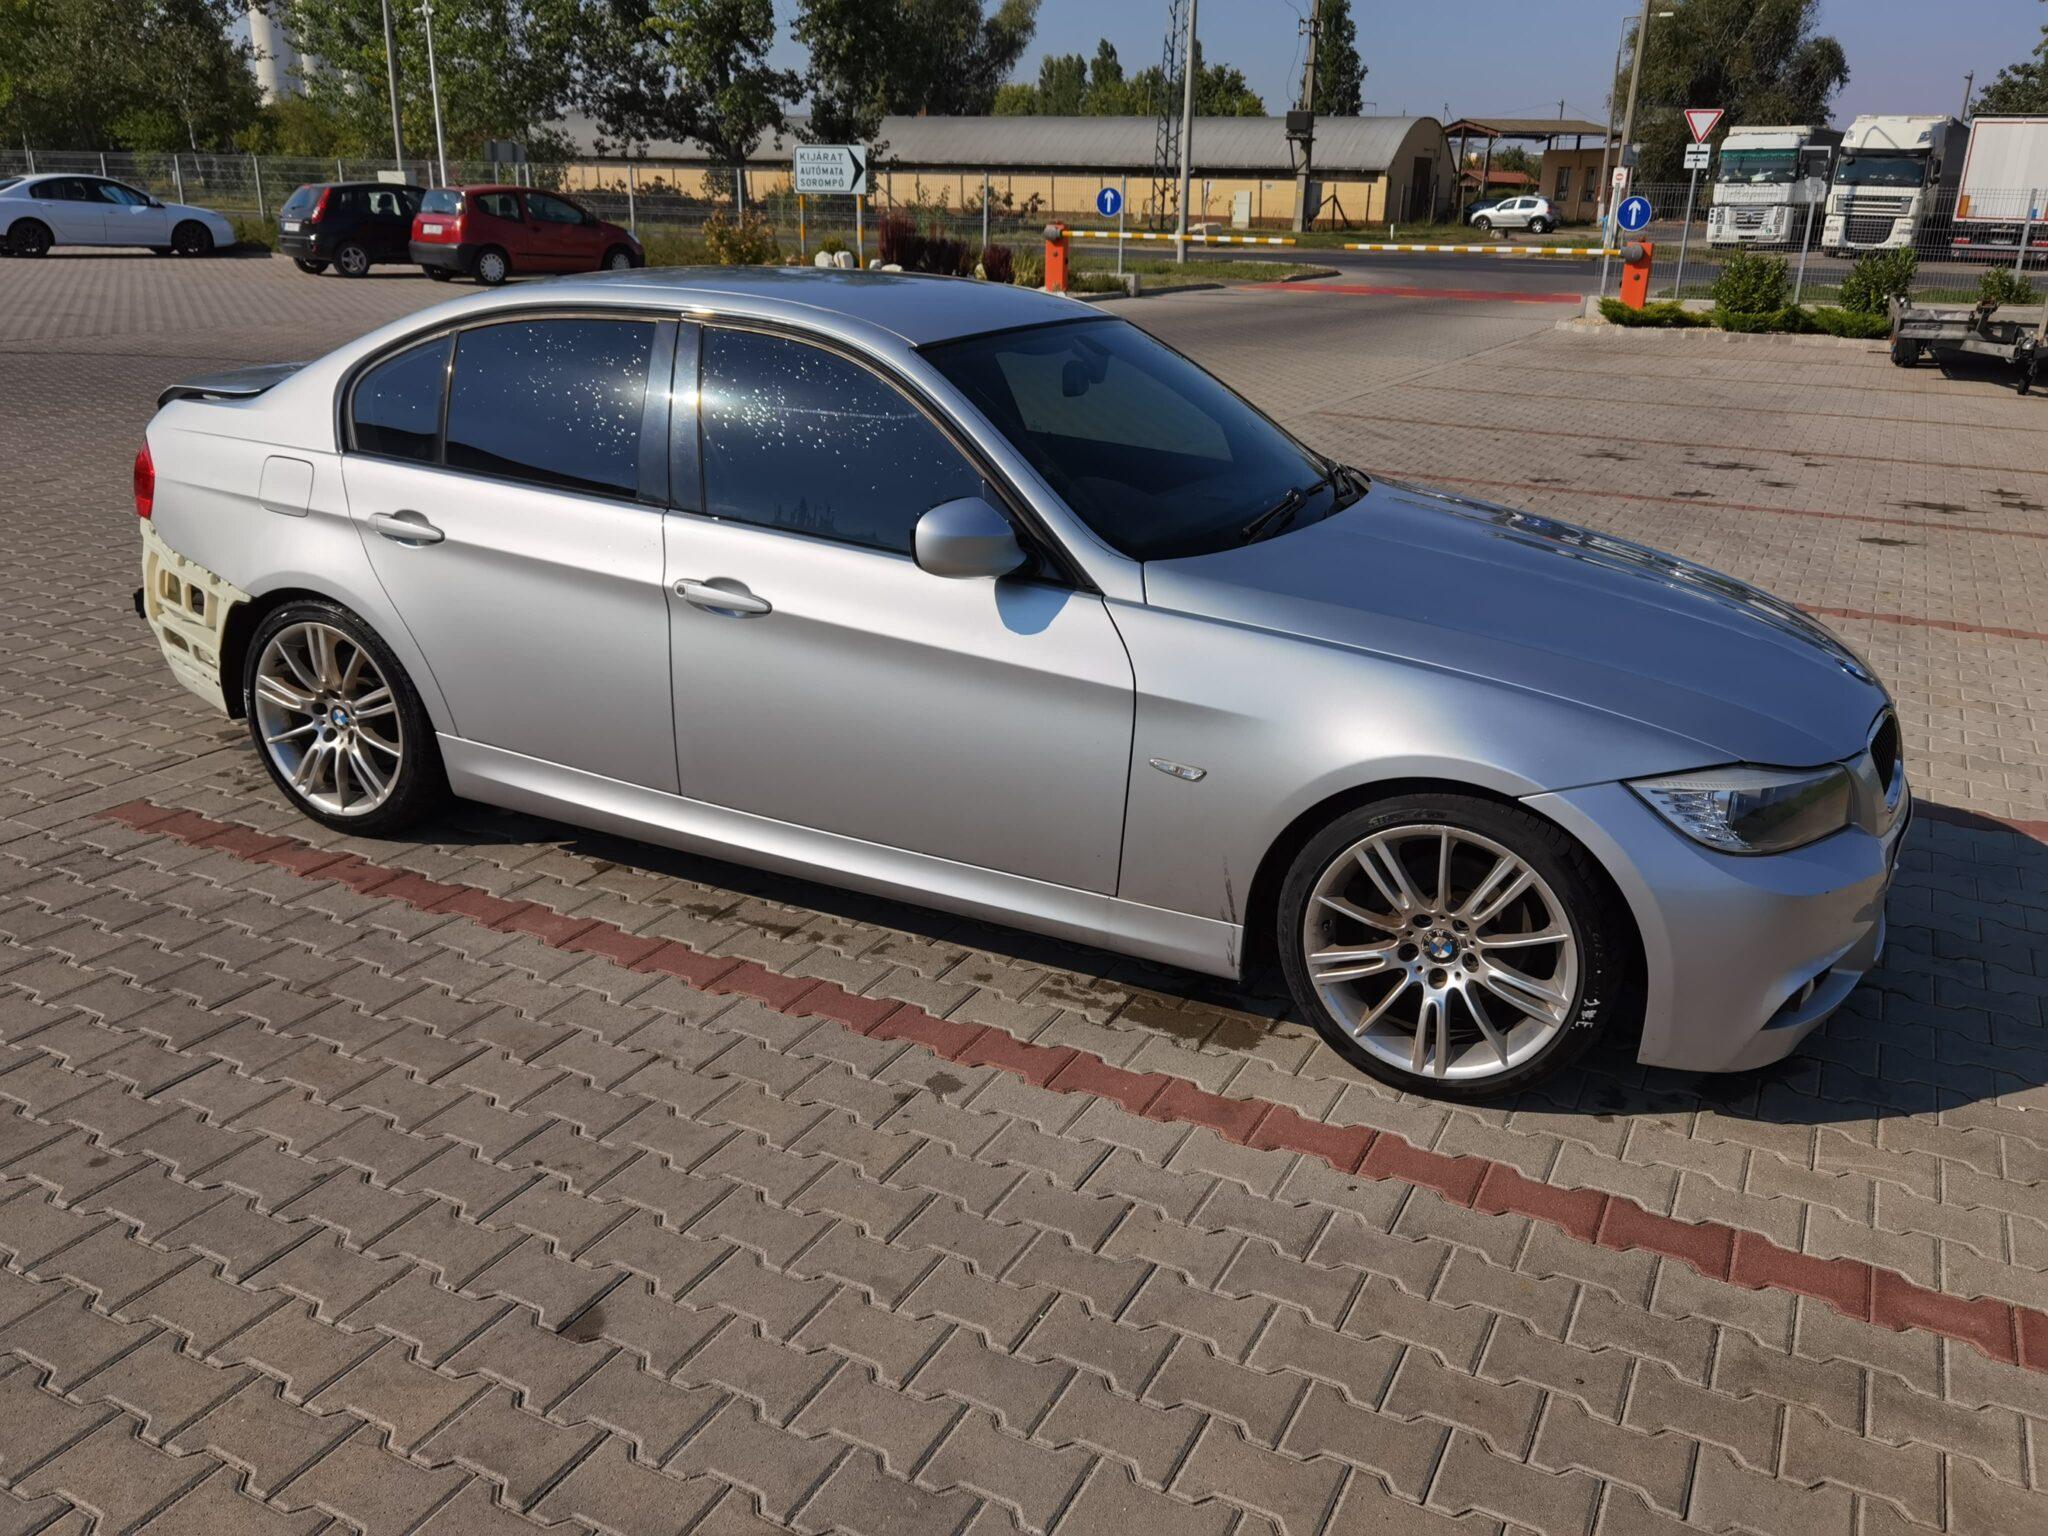 BMW E90 lci 318d Carbon Car Center Békéscsaba-1